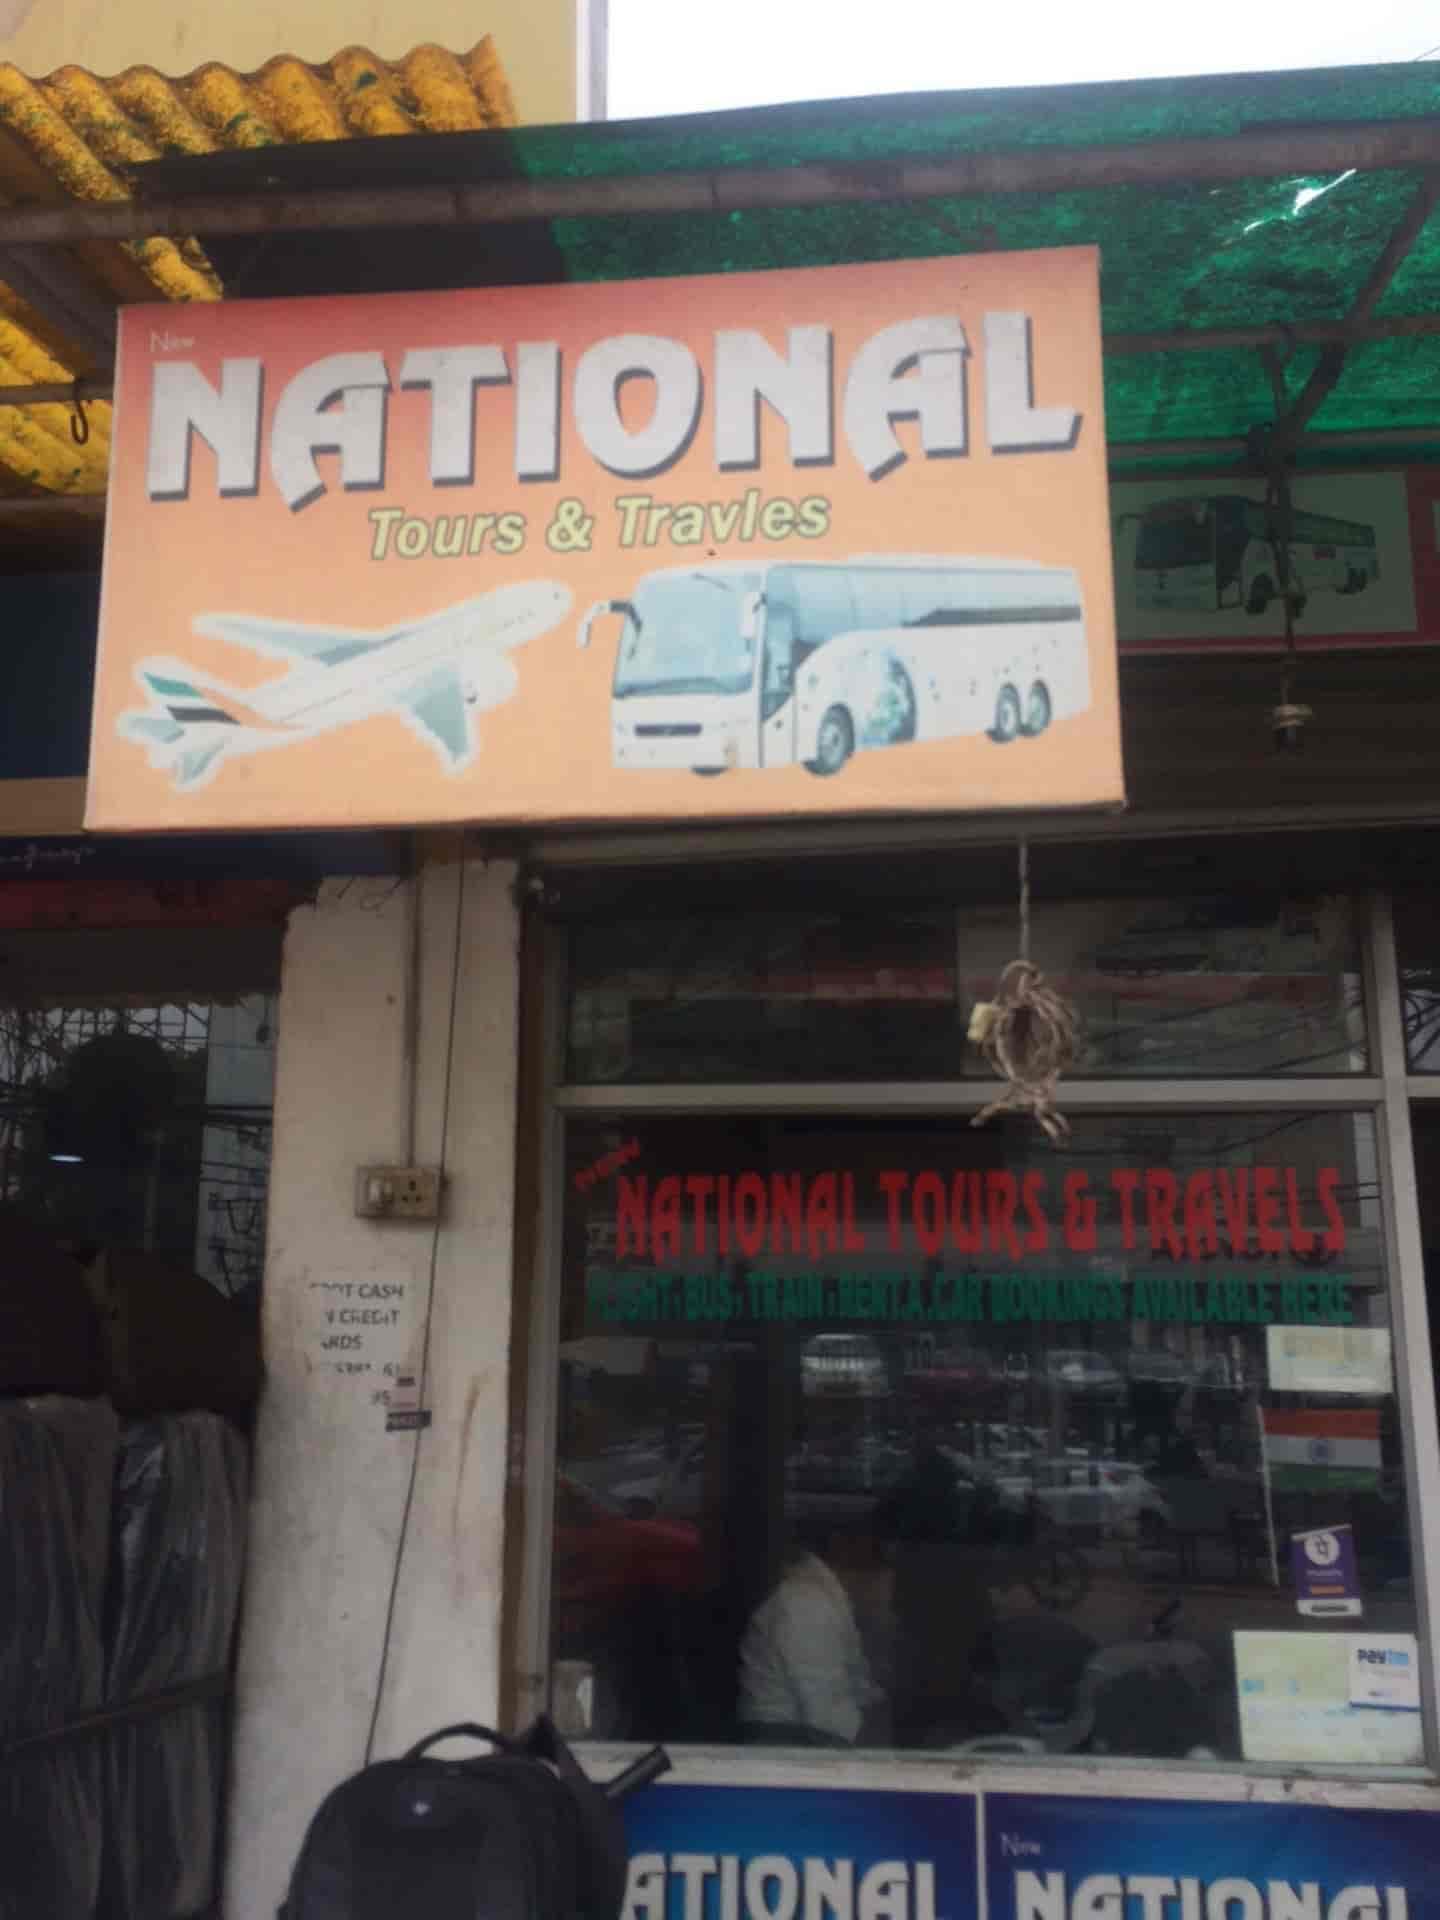 New National Tours & Travels, Kondapur - Air Ticketing